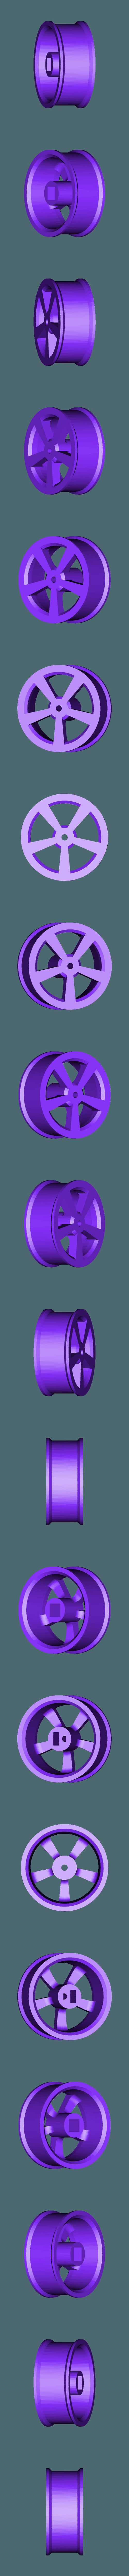 TruckV3_Axle2_Rear_rim_Single1.STL Download STL file 3D Printed RC Truck V3 • 3D print model, MrCrankyface